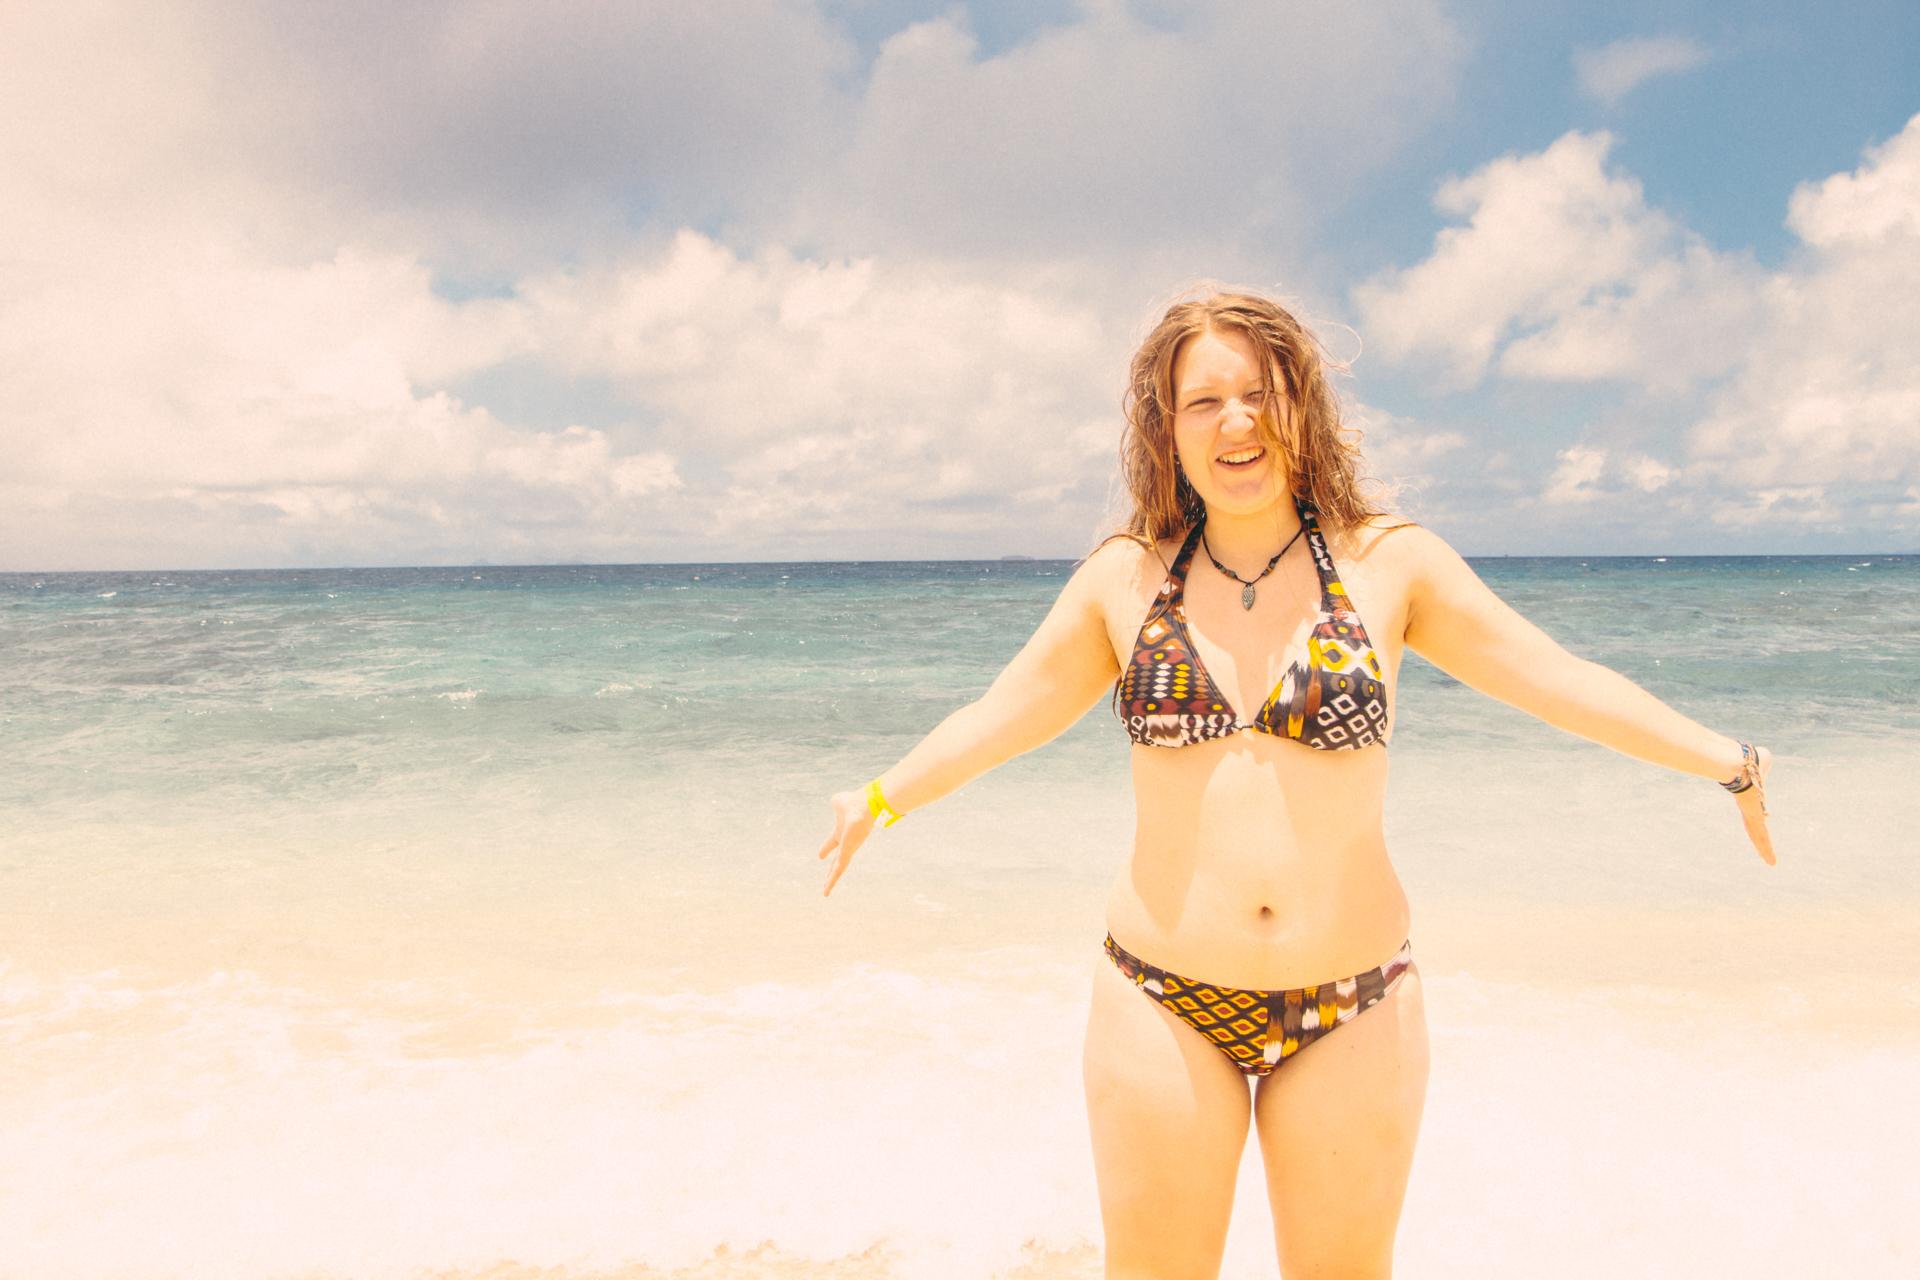 Alis on golden beach of South Sea Island, Fiji